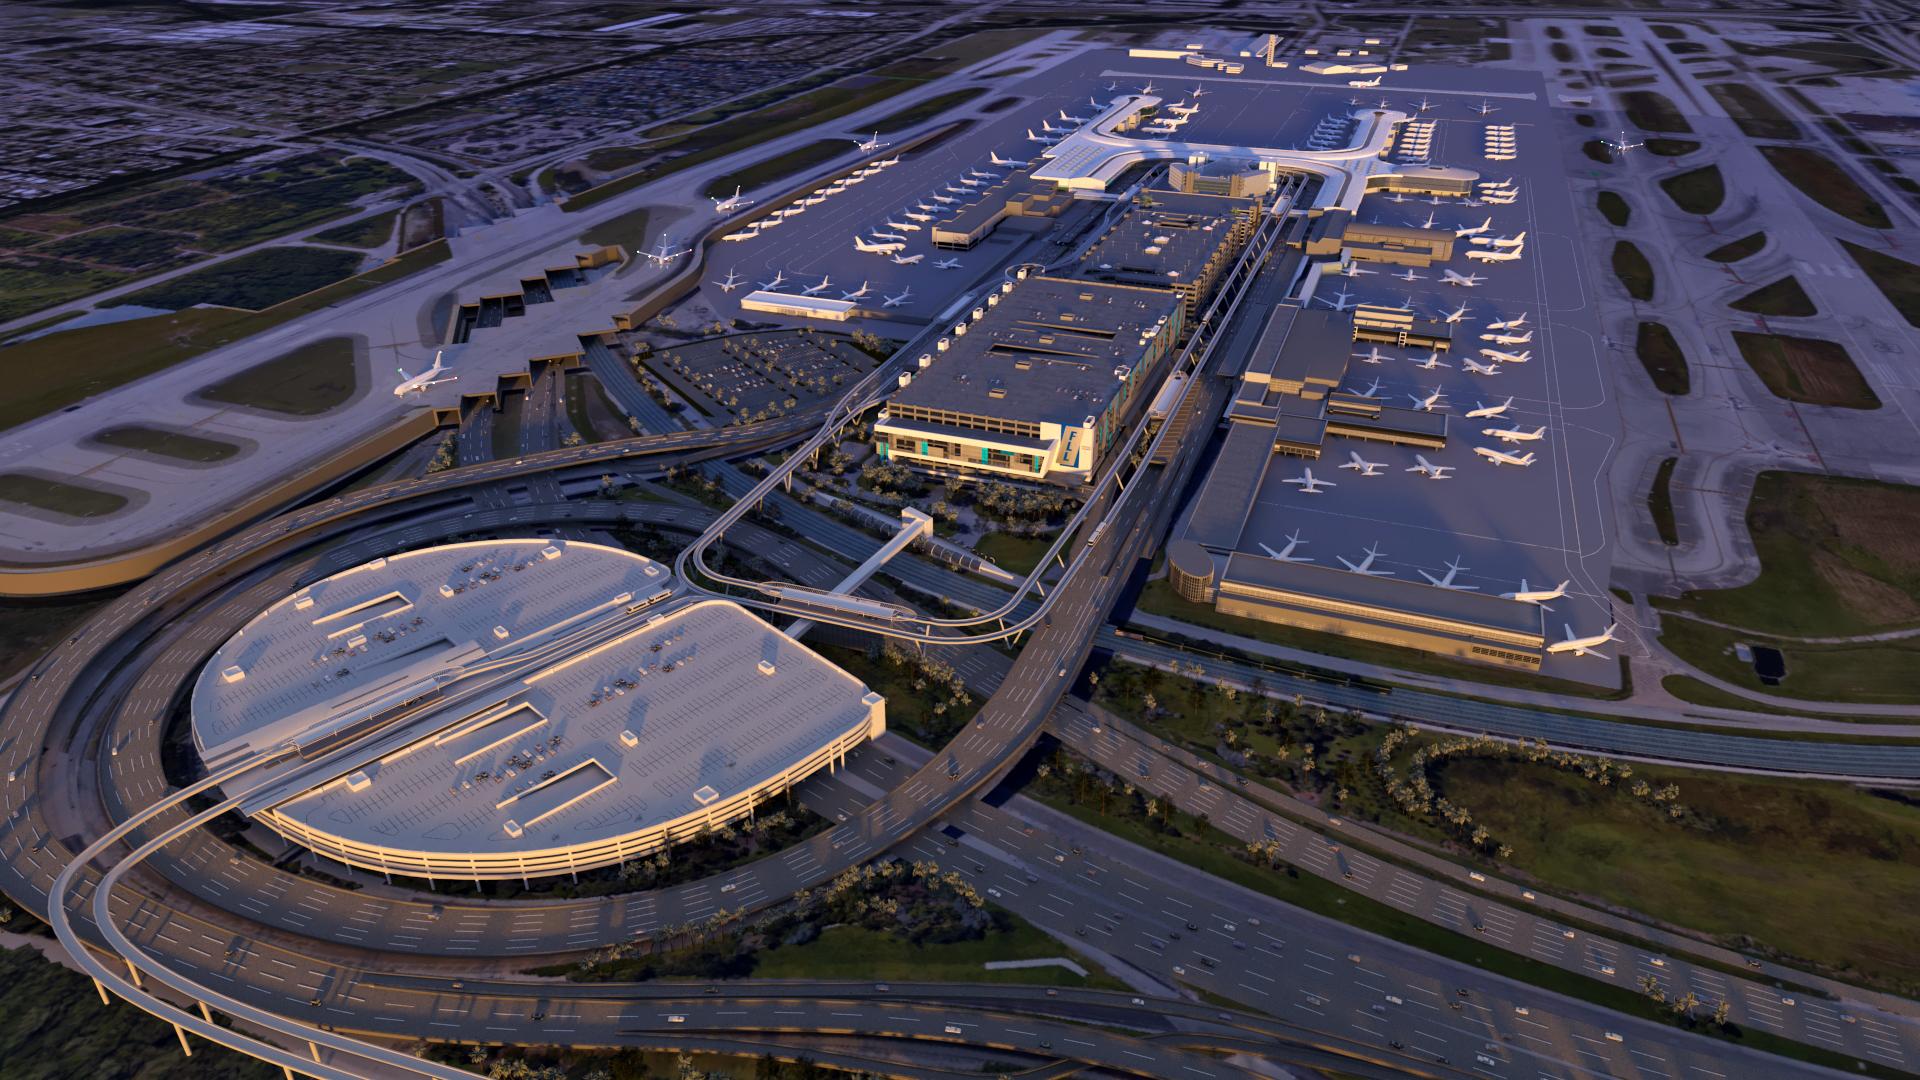 Fort Lauderdale-Hollywood International Airport